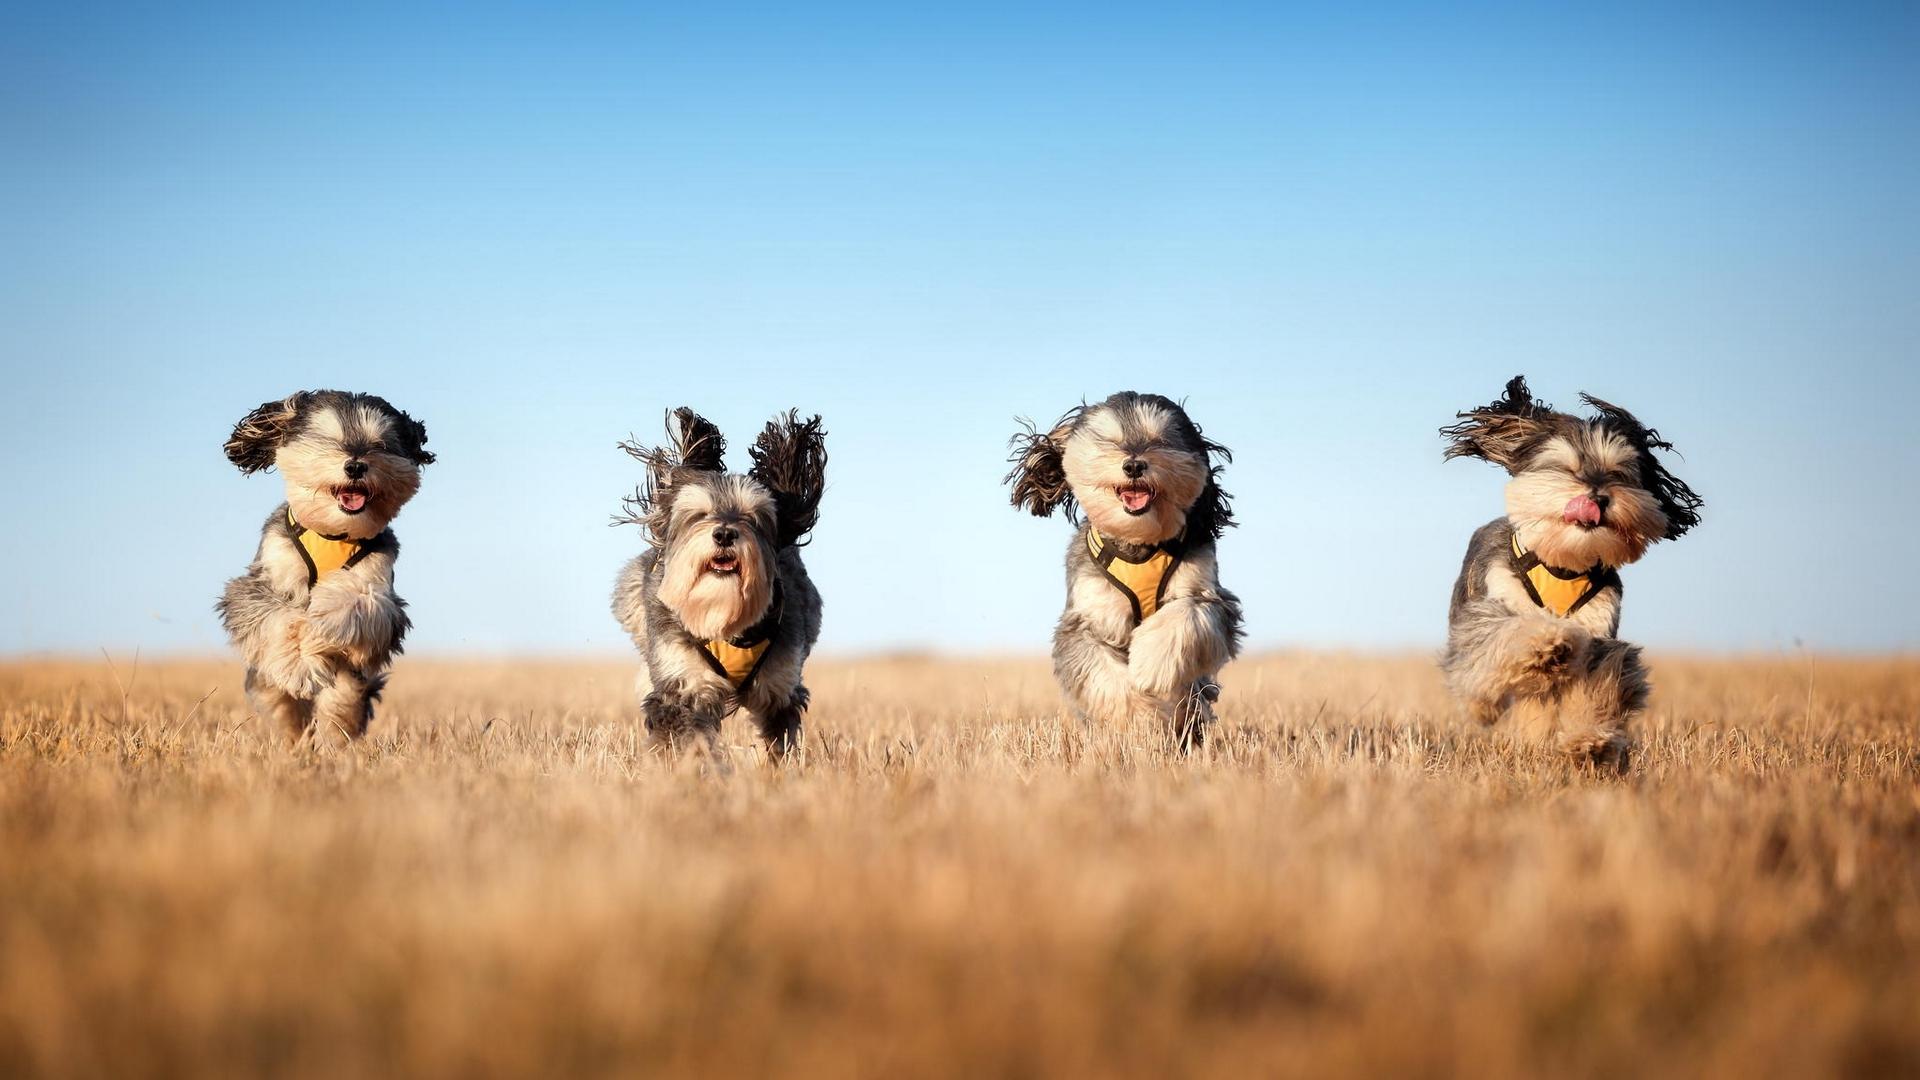 download wallpaper: rennende honden wallpaper